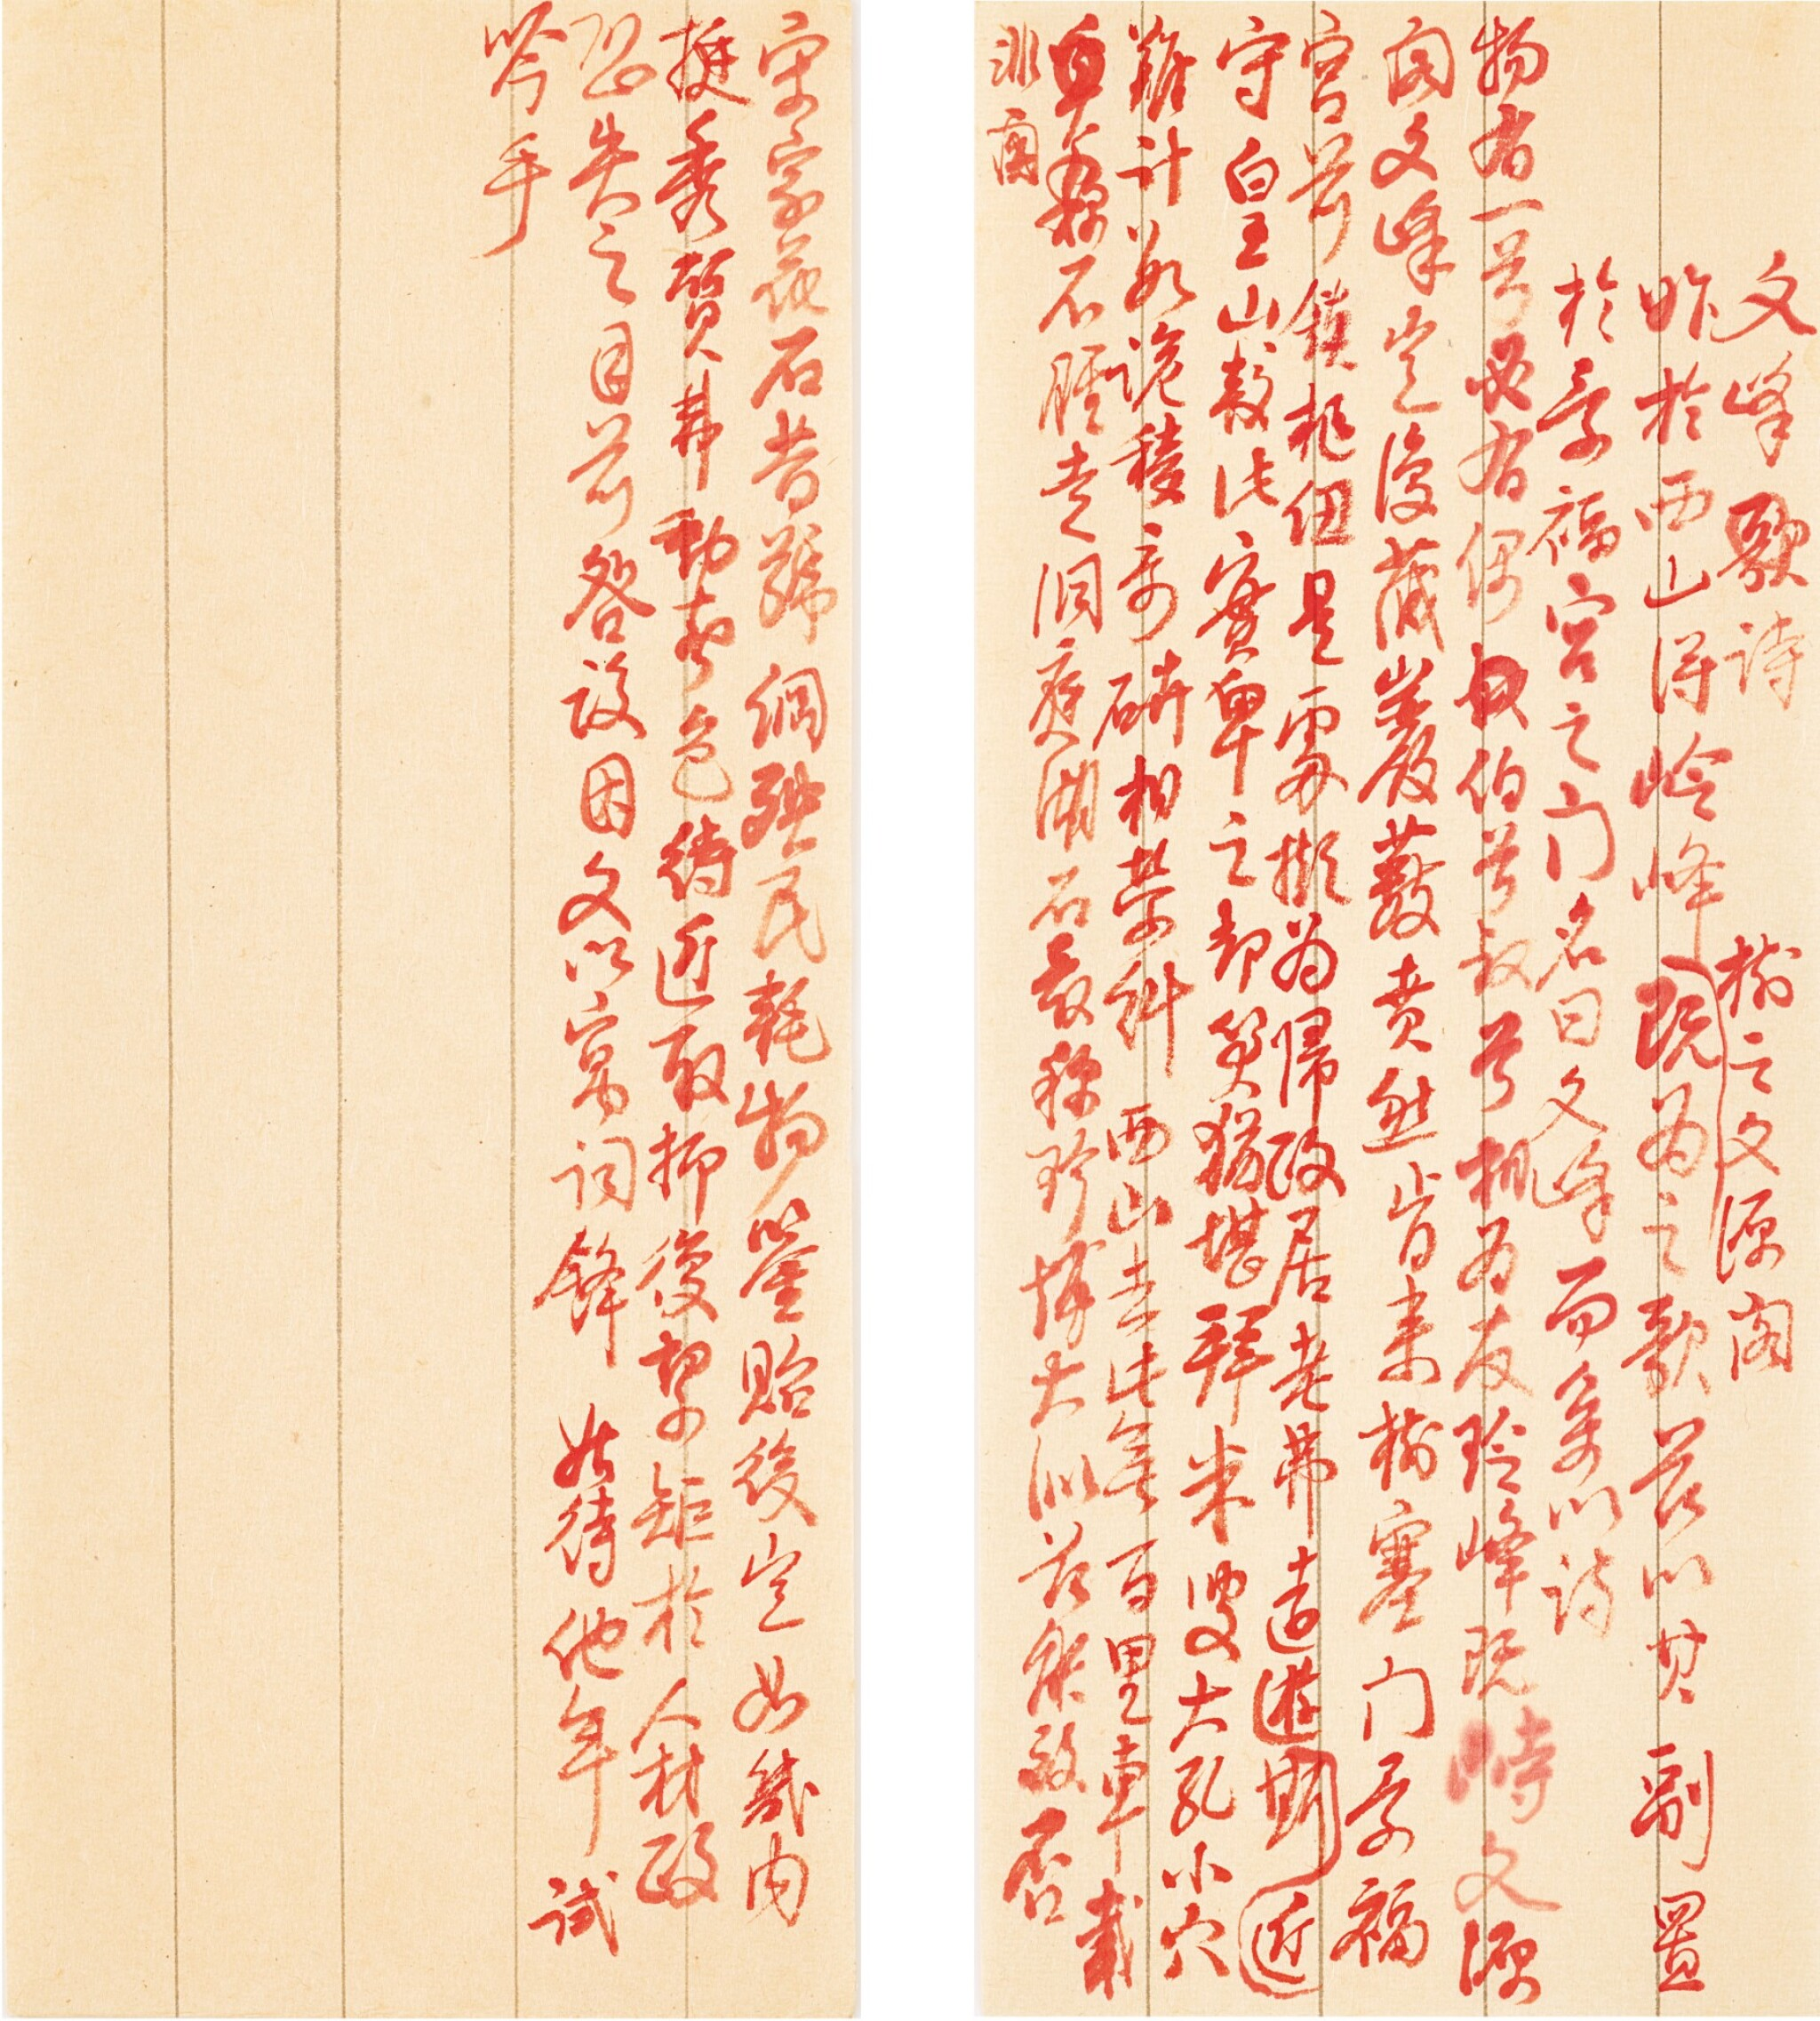 View full screen - View 1 of Lot 3115. Hongli (Emperor Qianlong) 1711-1799 弘曆(乾隆帝) 1711-1799   Manuscript of Wenfeng Stone Poem 御製《文峰詩稿》.